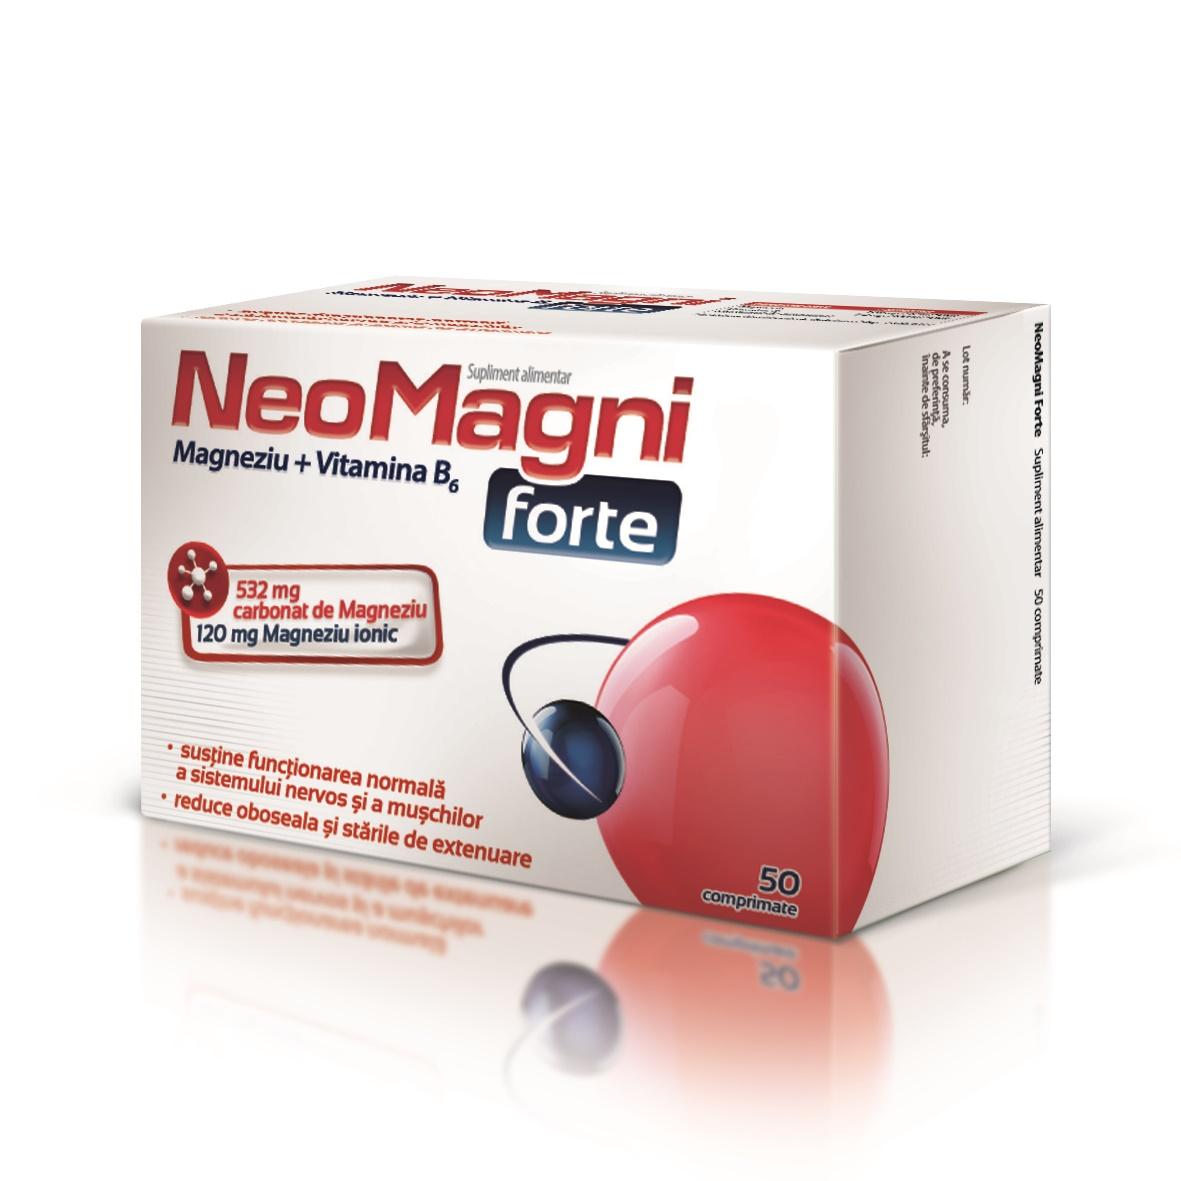 NeoMagni Forte, 50 comprimate, Aflofarm drmax poza